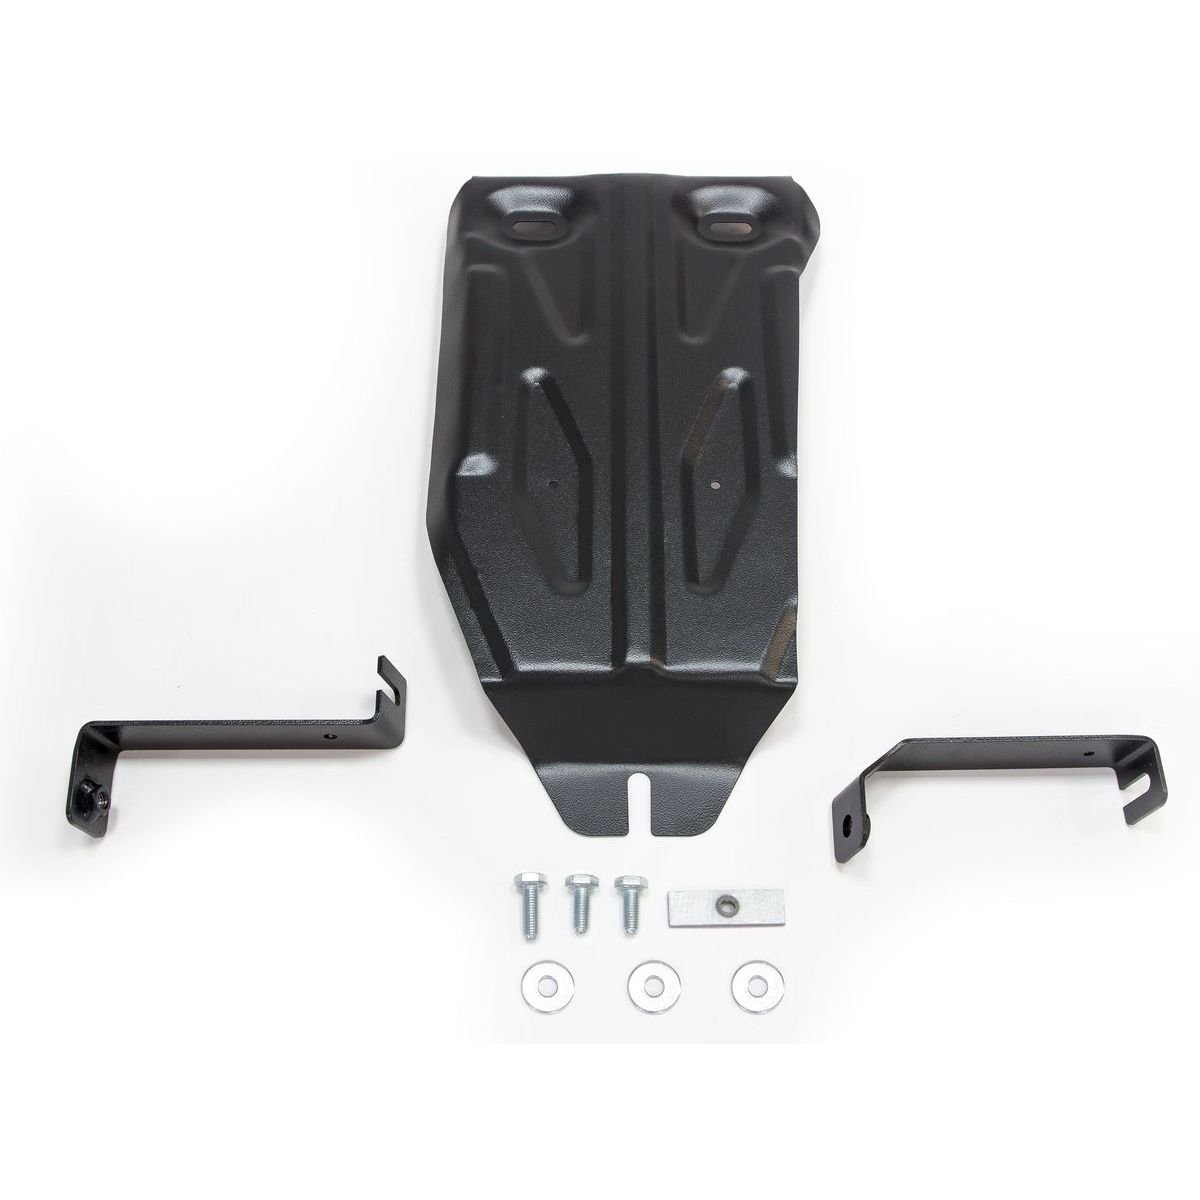 Защита редуктора Rival для Nissan Terrano III 4WD 2014-2016 2016-н.в./Renault Duster I 4WD 2011-2015 2015-н.в./Kaptur 4WD 2016-н.в., сталь 2 мм, с крепежом. 111.4719.1 защита редуктора автоброня для nissan terrano 4wd 2014 н в renault duster 4wd 2011 н в kaptur 4wd 2016 н в сталь 2 мм 111 04719 1